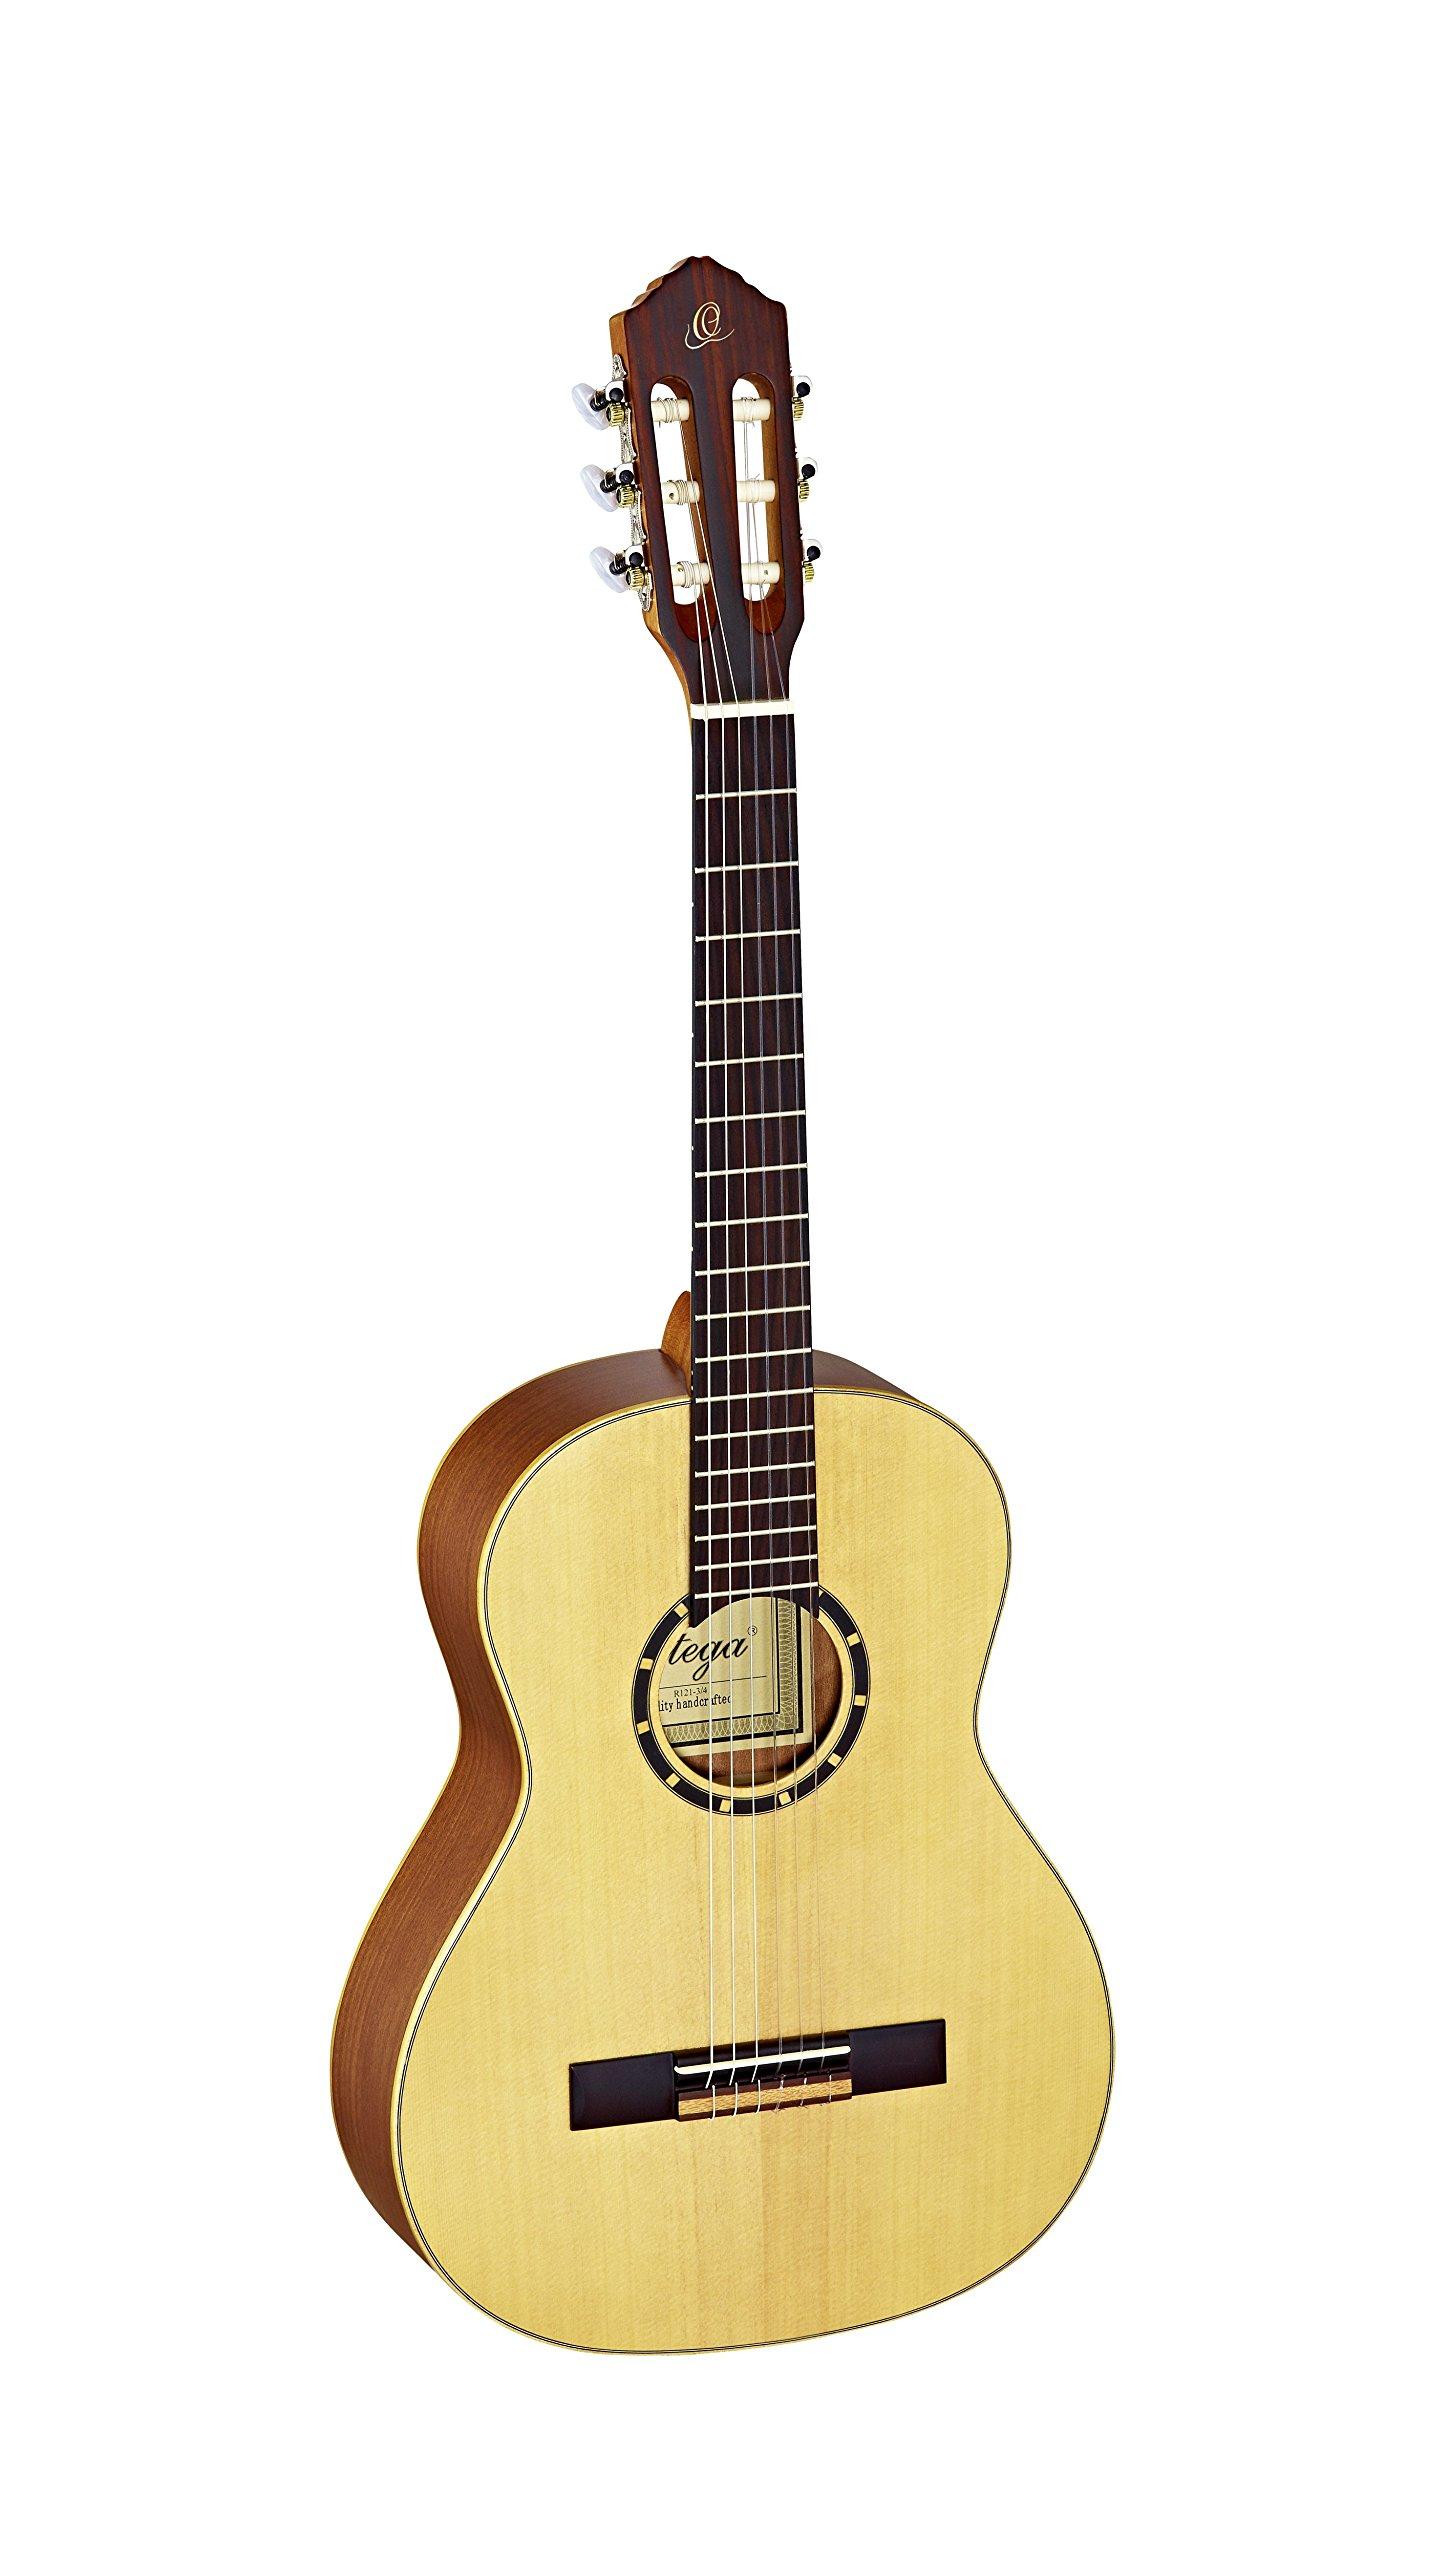 Ortega Guitars 6 String Family Series 3/4 Size Nylon Classical Guitar w/Bag, Right, Spruce Top-Natural-Satin, (R121-3/4)